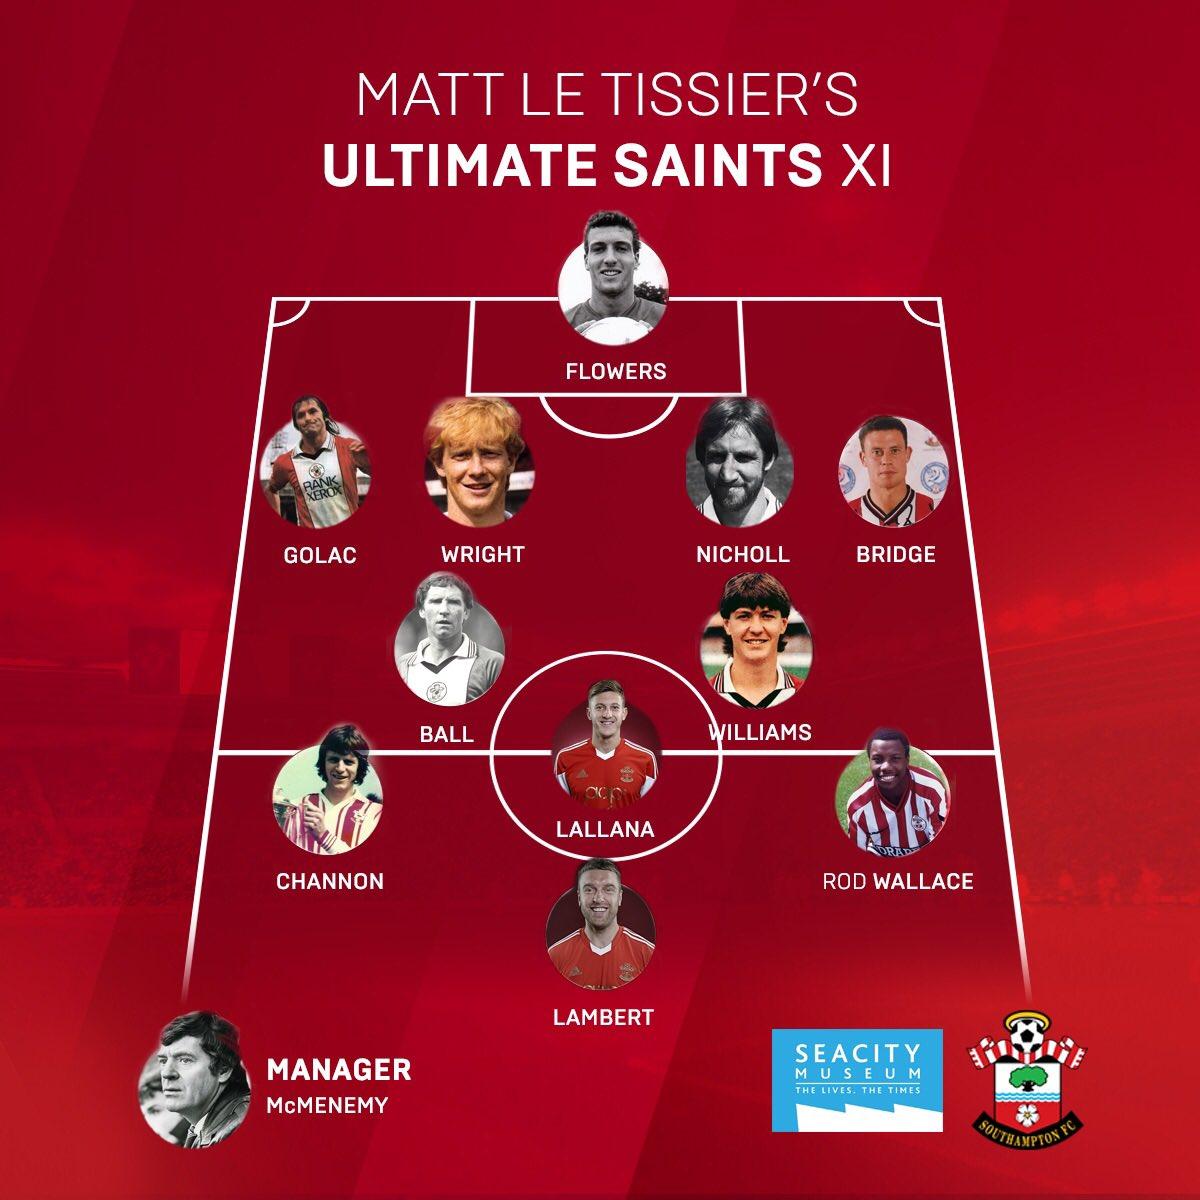 Southampton Fc On Twitter Saintsfc Legend Mattletiss7 Has Chosen His Fans Ultimate Xi What Would Yours Be Vote Here Https T Co Nhalgzekqv Https T Co Dmjyaiih69